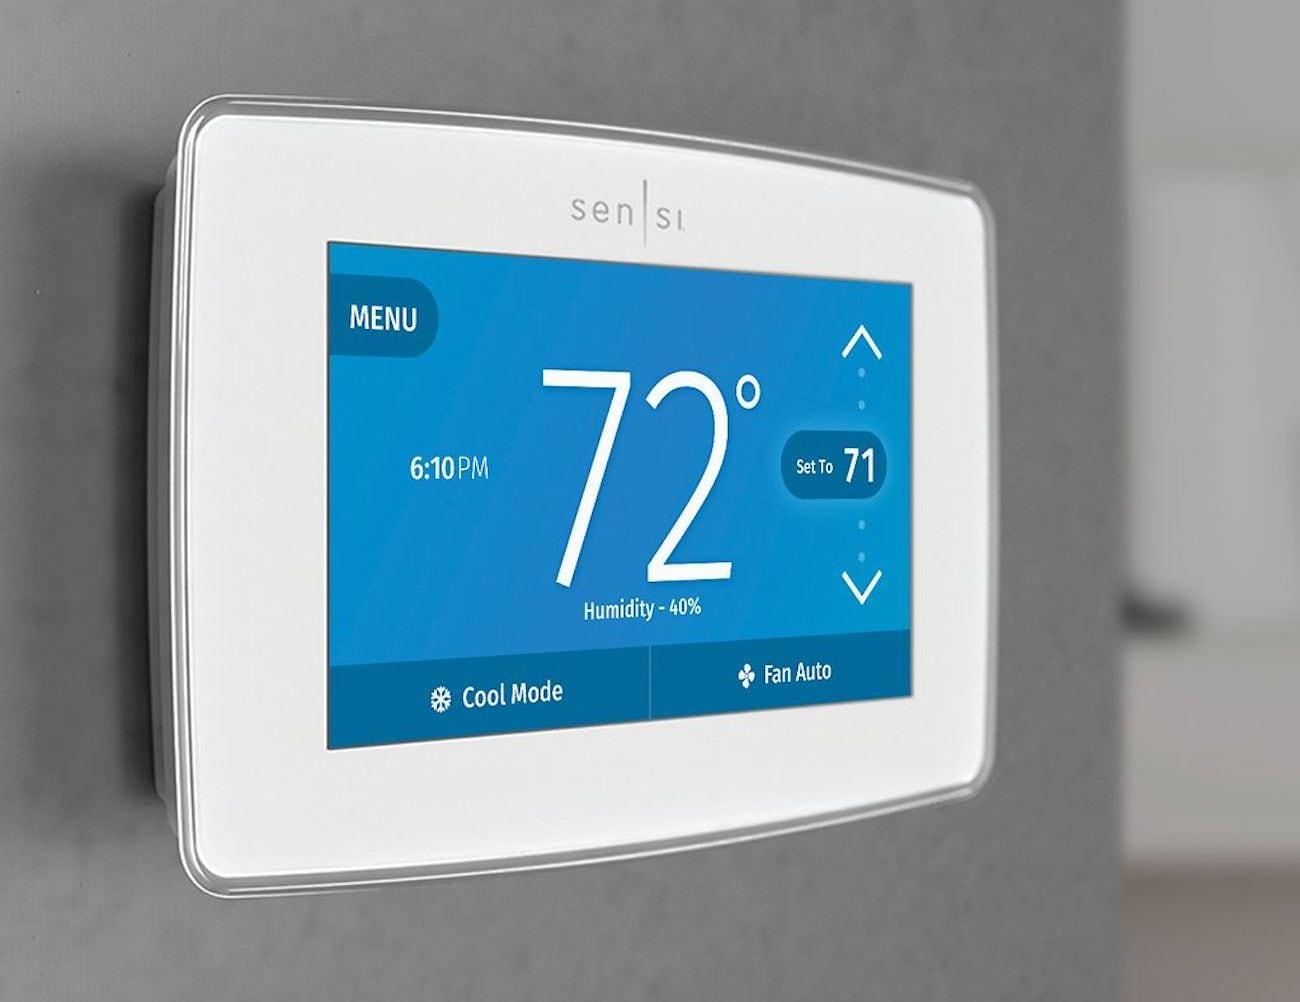 Sensi Touch Smart Wi-Fi Thermostat